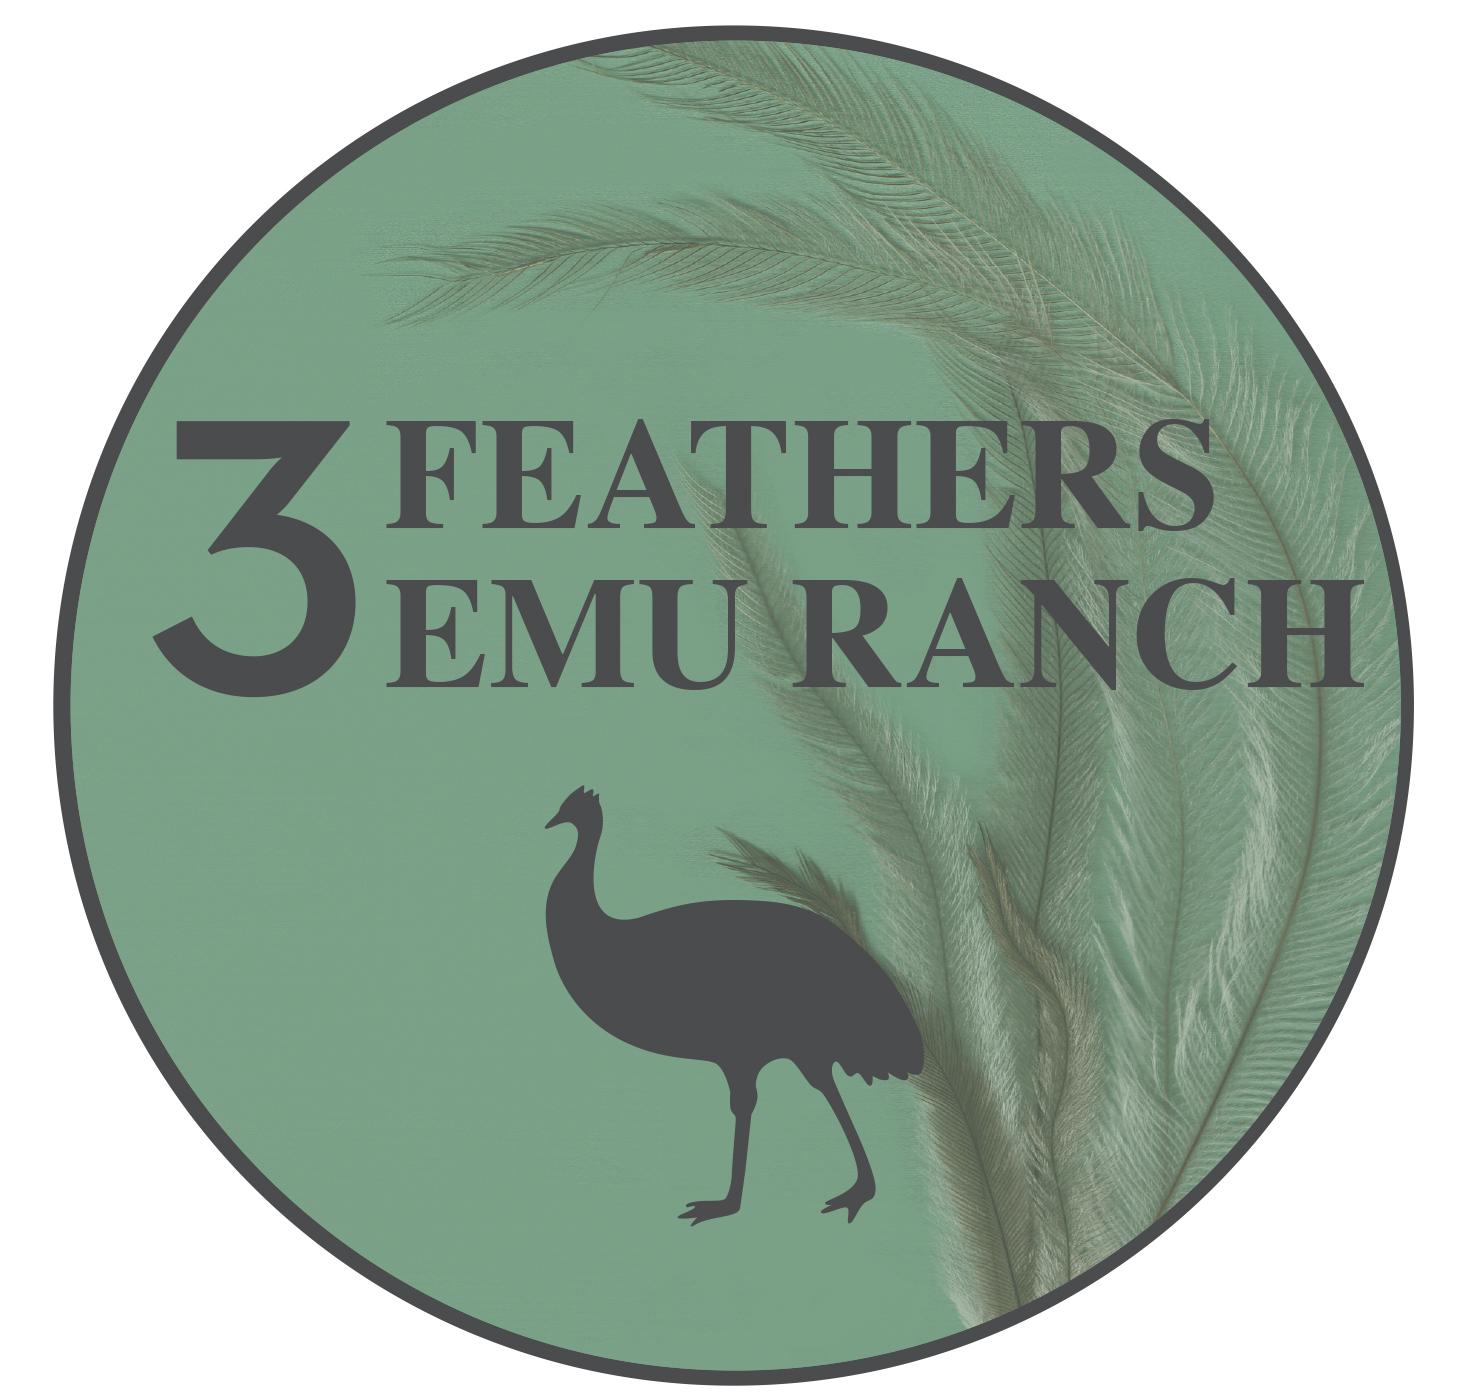 3 Feathers Emu Ranch Logo